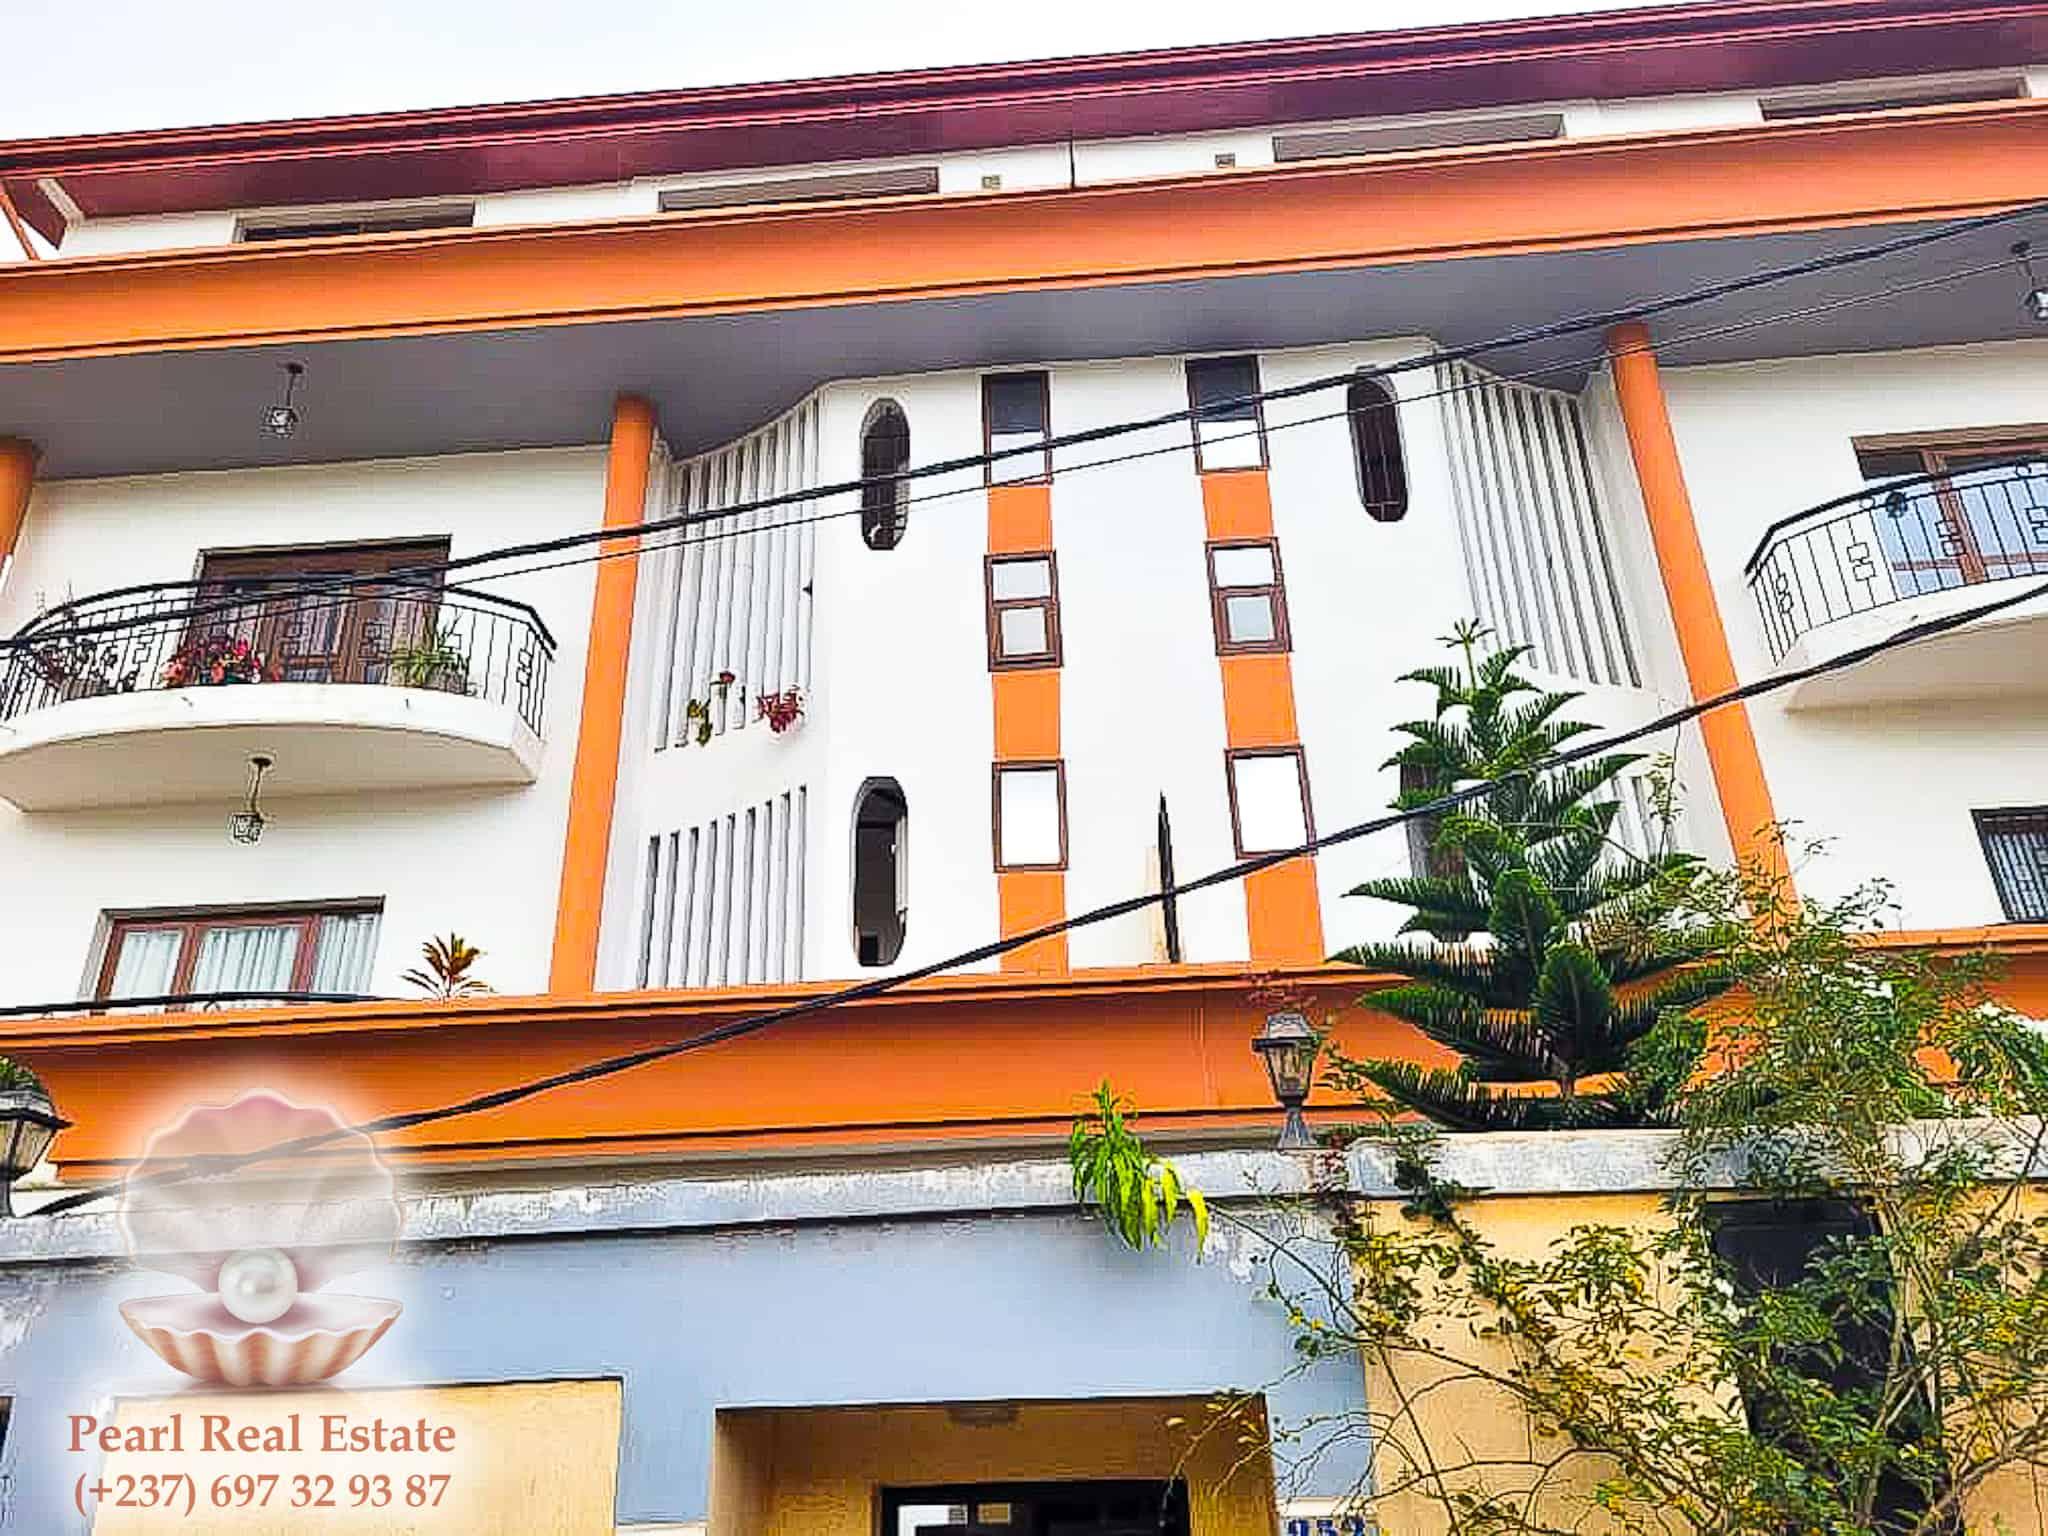 Apartment to rent - Yaoundé, Quartier Fouda, Omnisports - 1 living room(s), 3 bedroom(s), 2 bathroom(s) - 400 000 FCFA / month